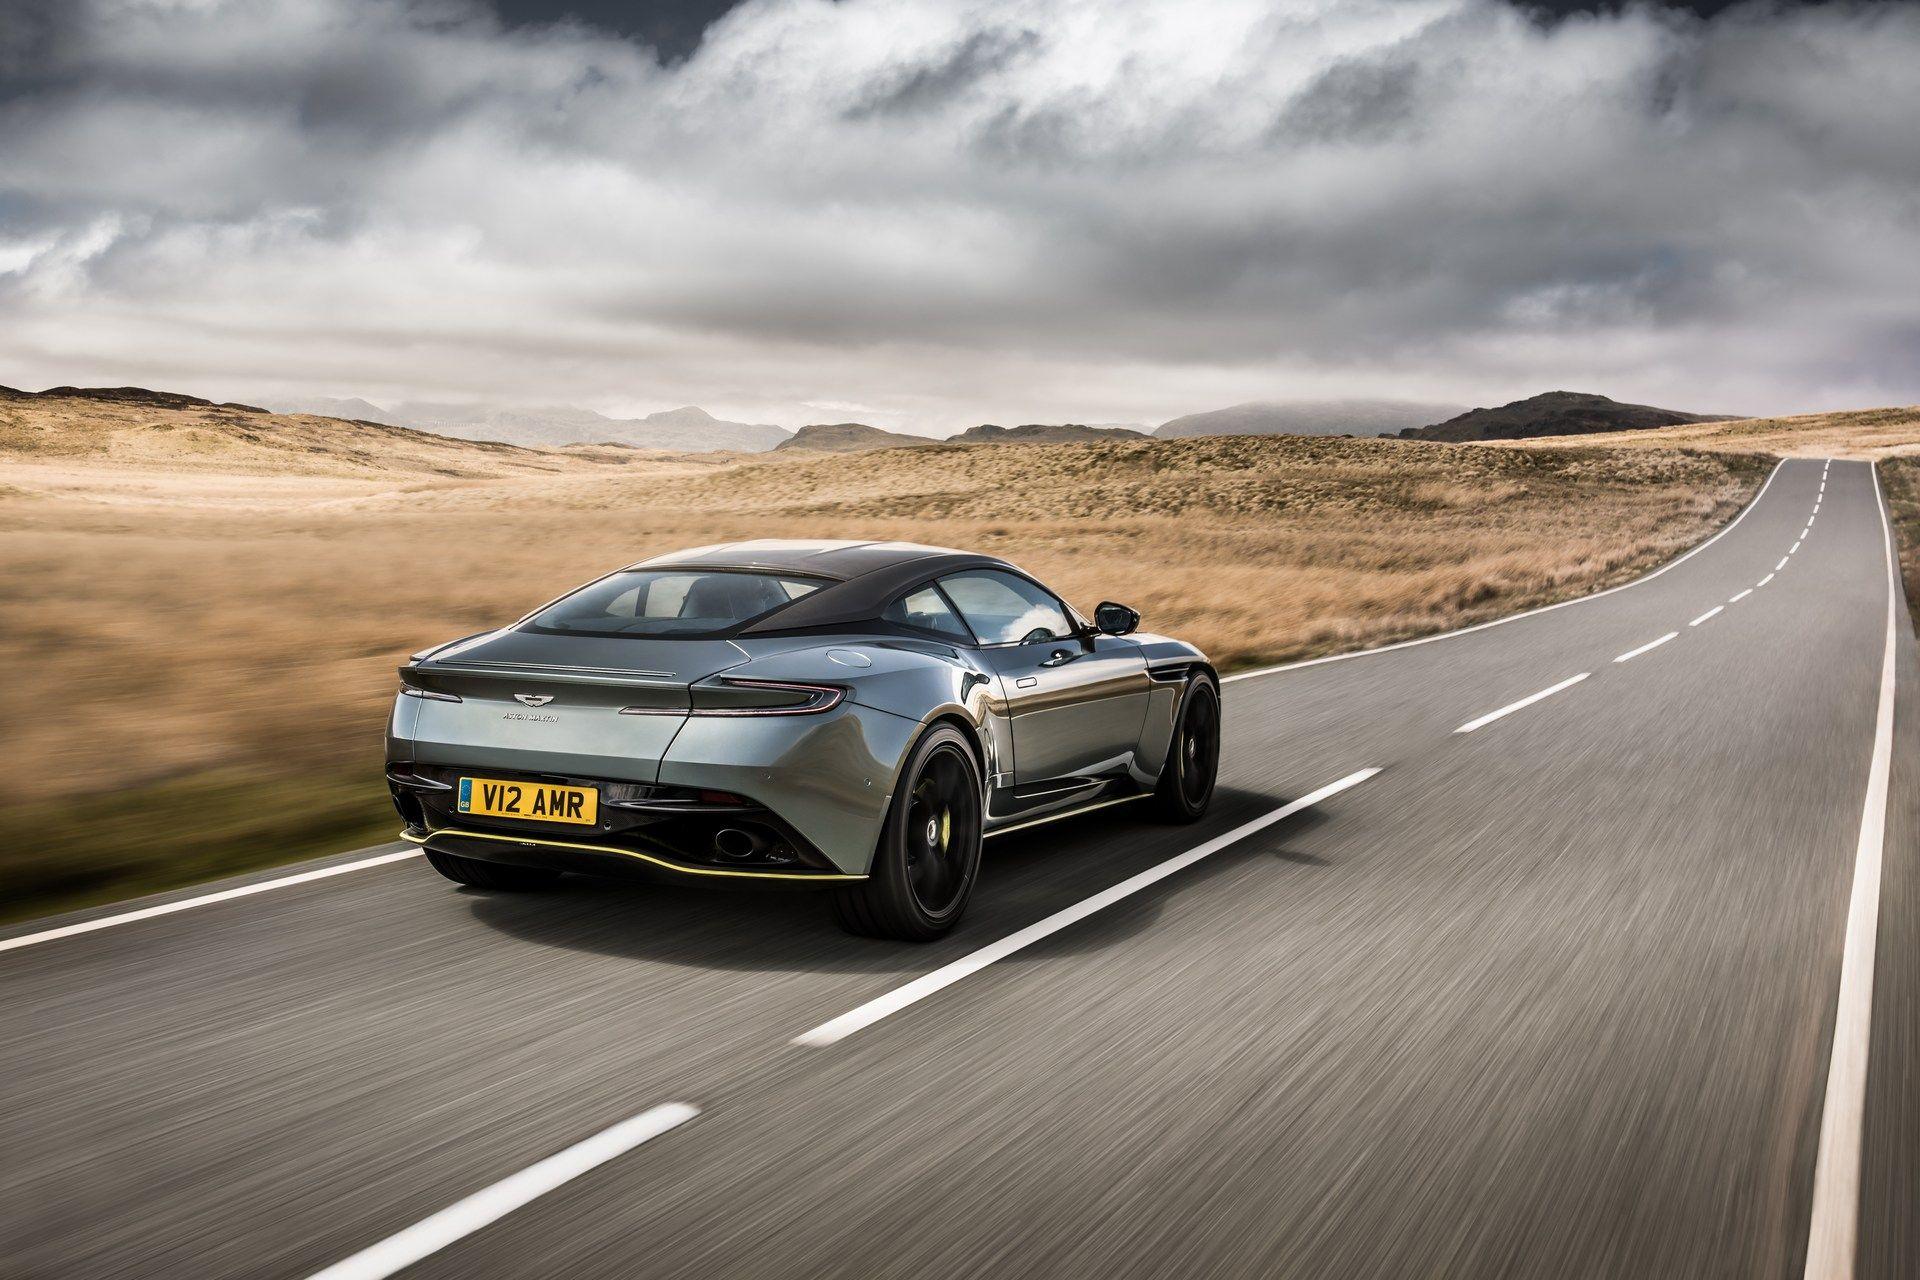 Aston-Martin-DB11-AMR-4